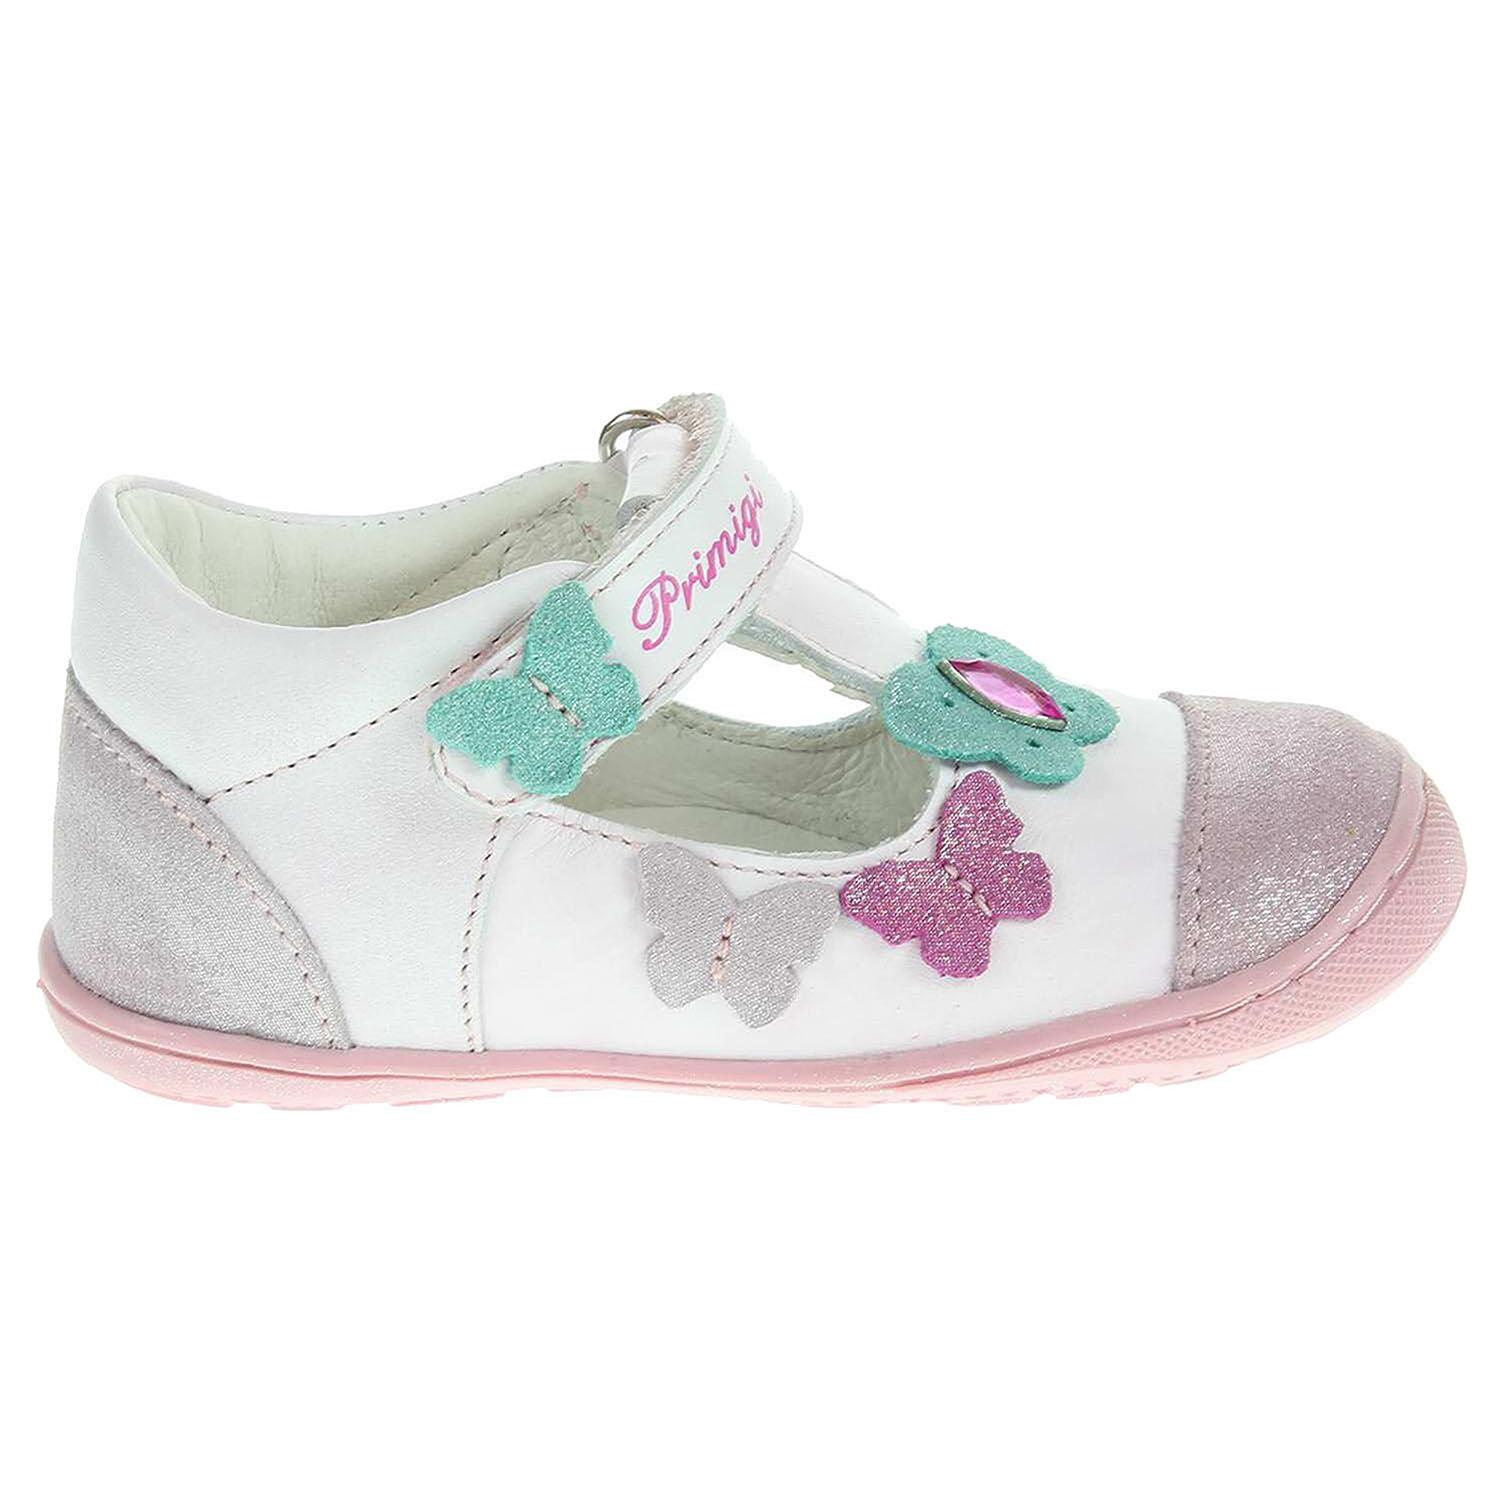 Primigi Greta 5059077 dívčí sandály růžové 20